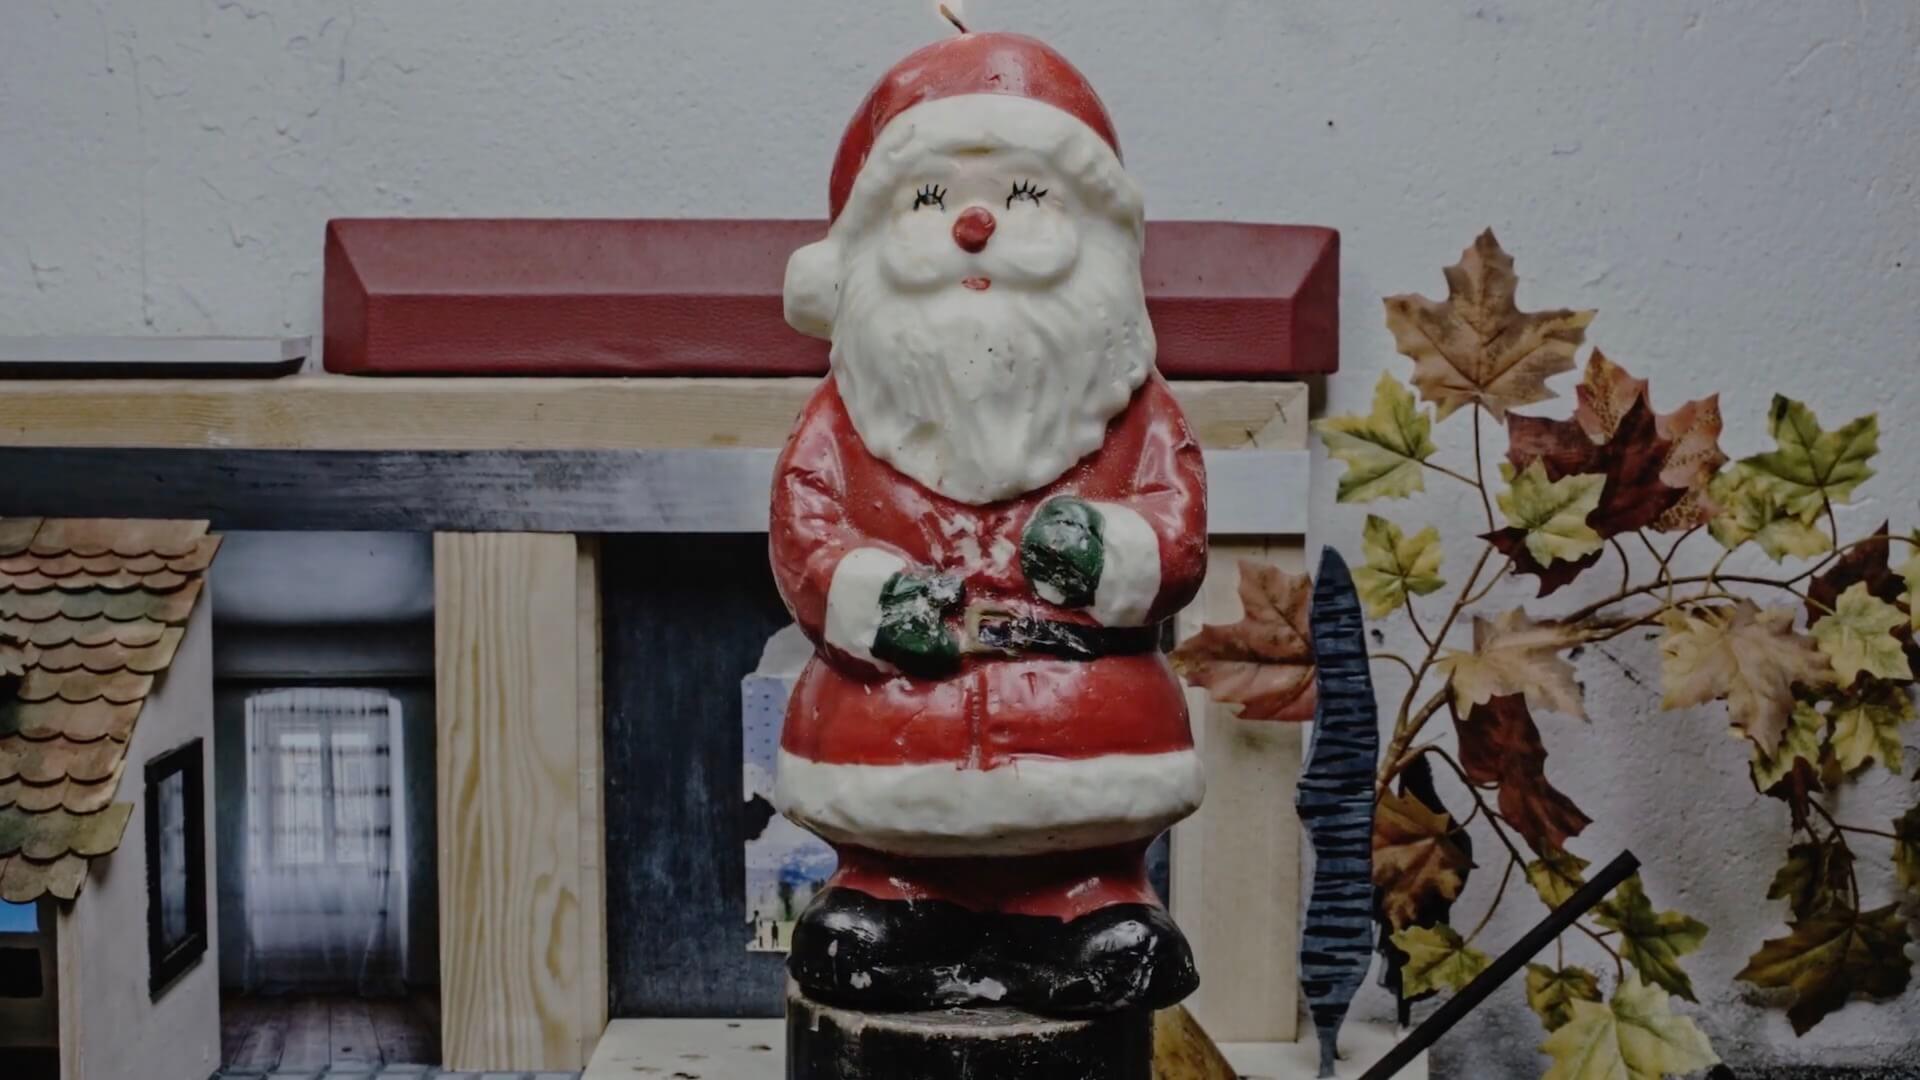 Chilly Gonzalesがクリスマス・アルバム『A very chilly christmas』リリース記念にスペシャルライブ配信を開催!クリスマス・ミックステープもリリース music20124_chillygonzales_averychilly-christmas_2